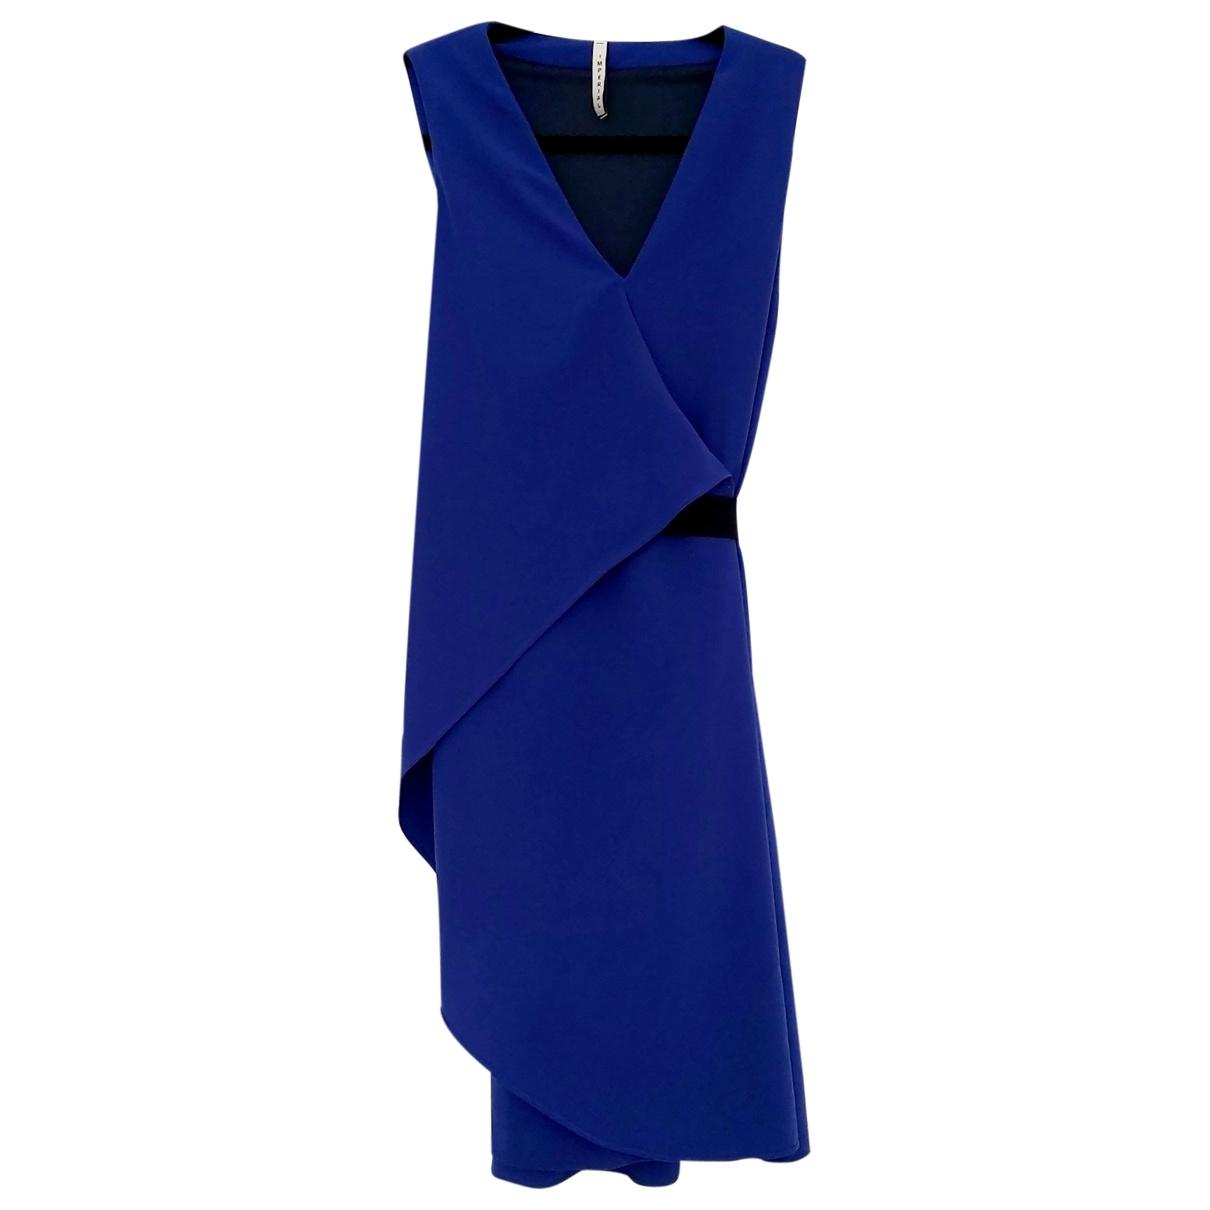 Impérial \N Blue dress for Women 38 FR